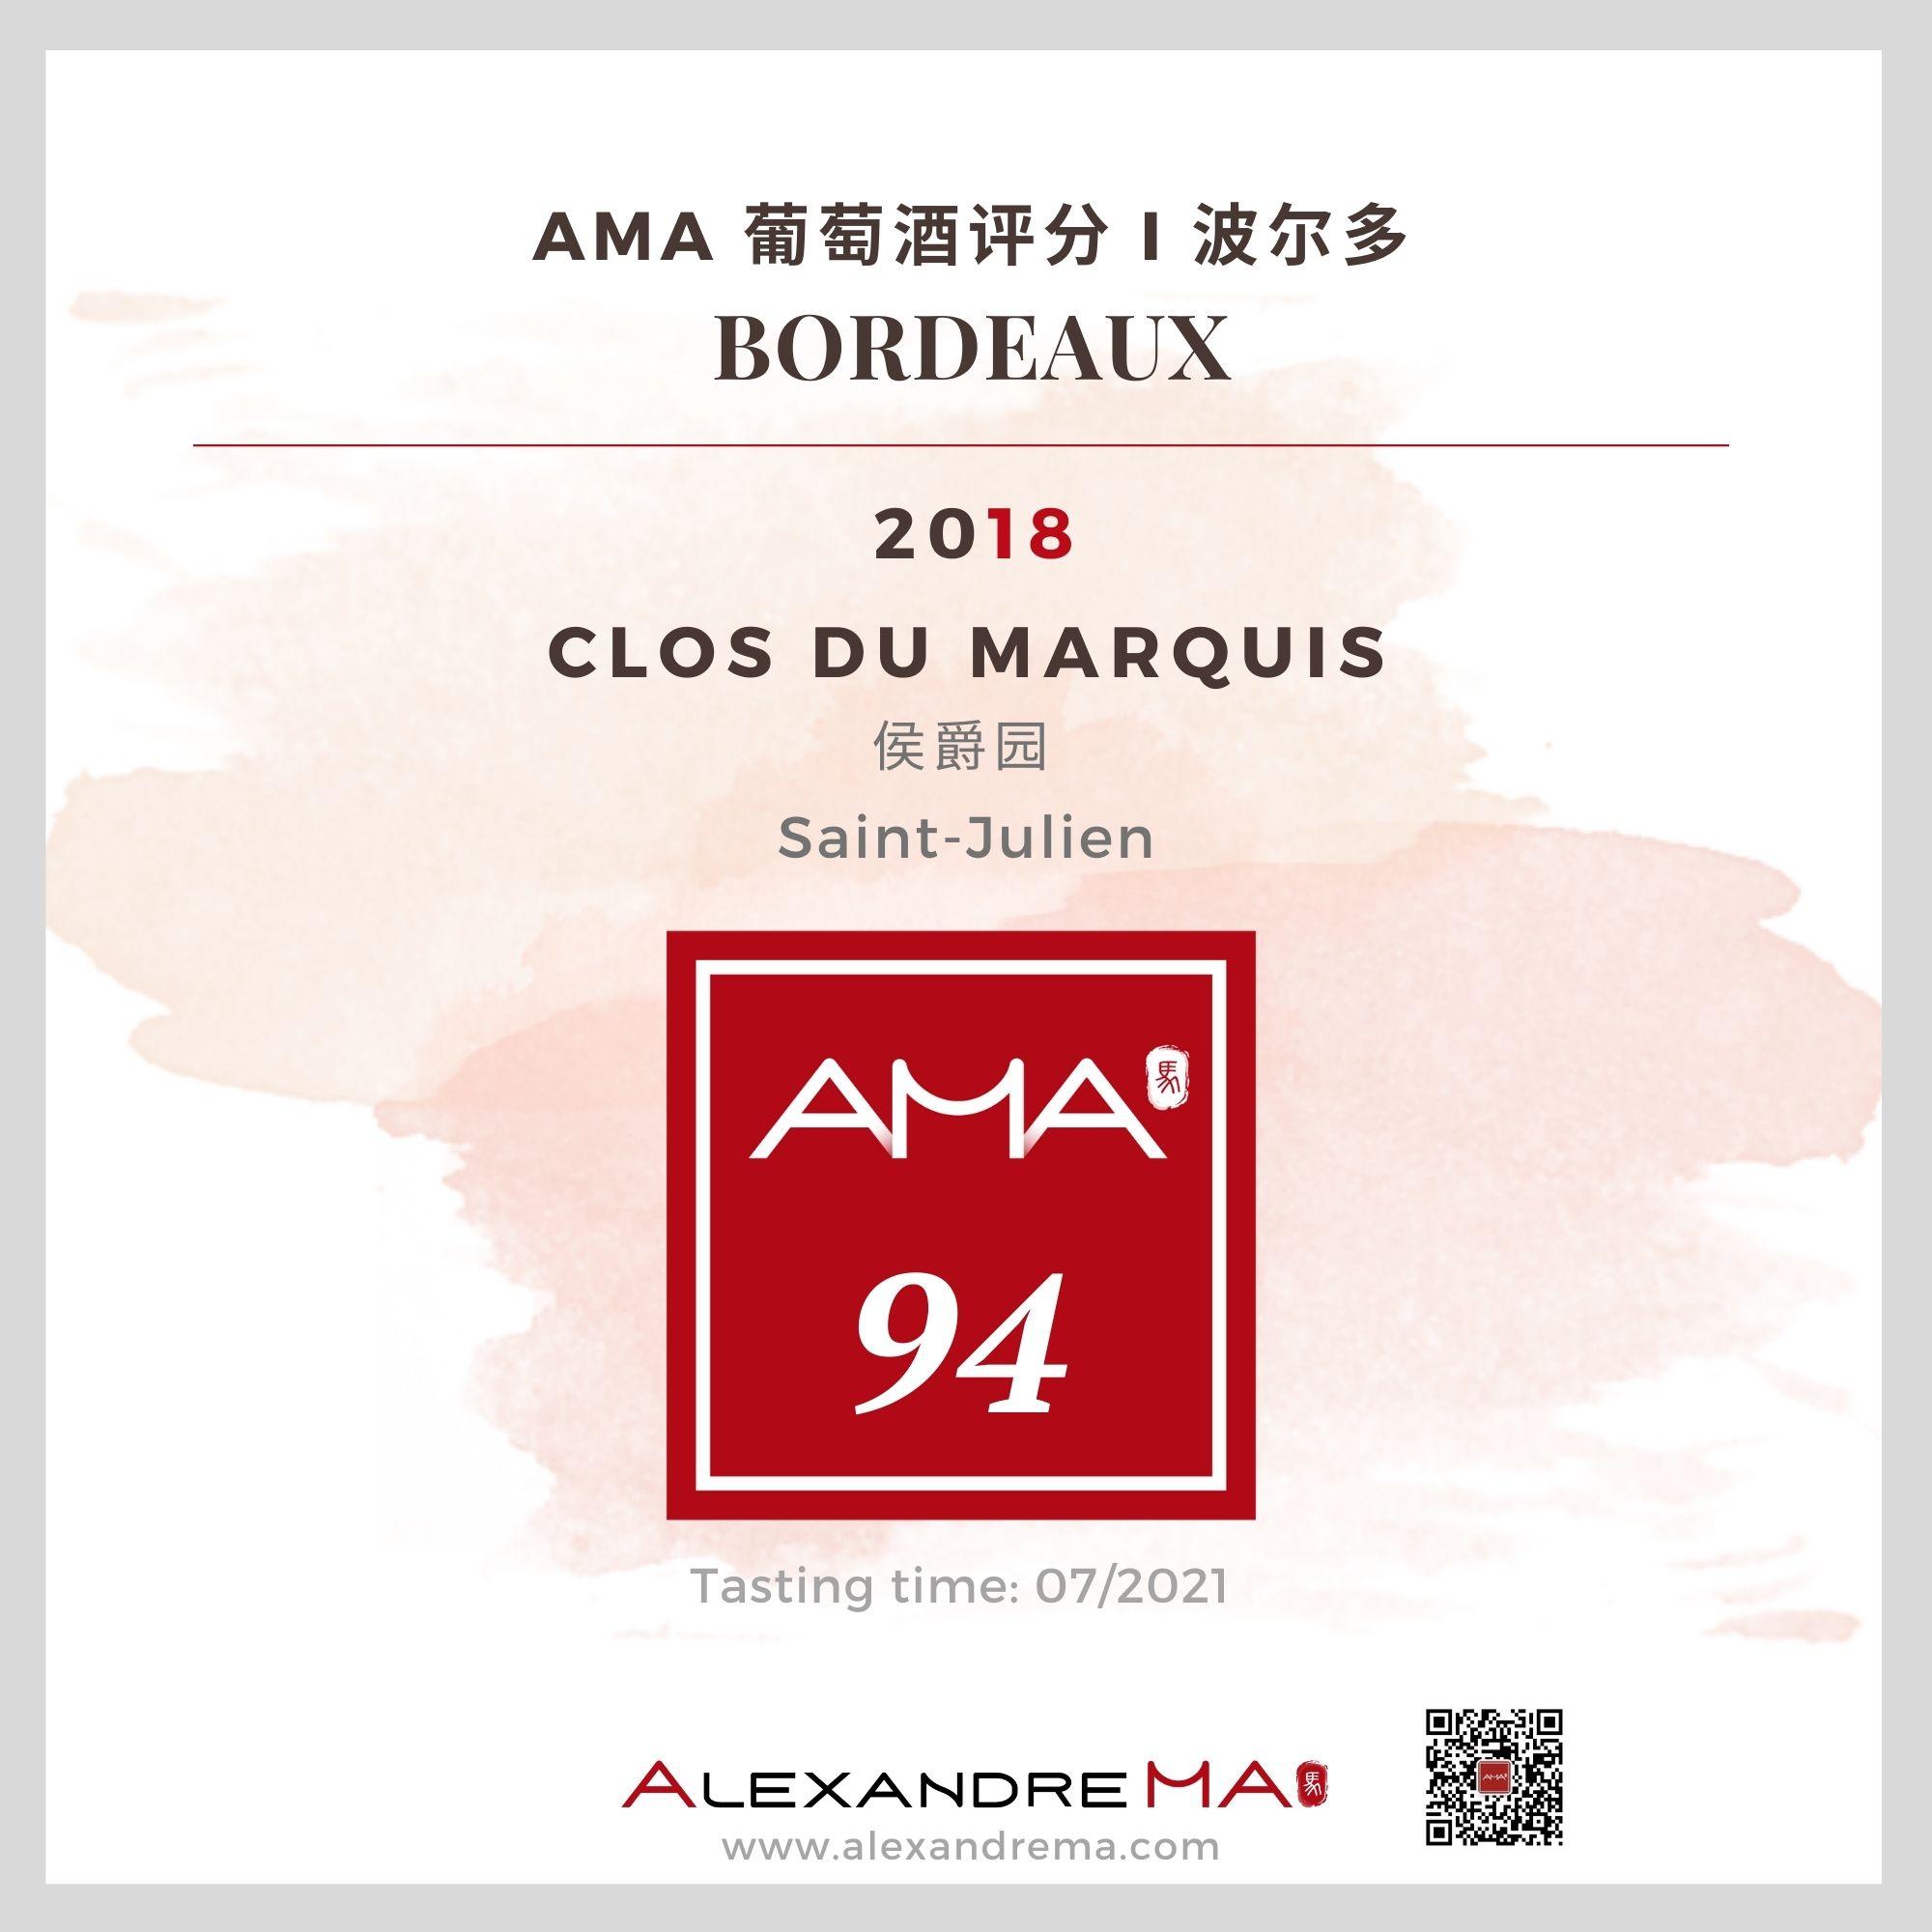 Clos du Marquis 2018 - Alexandre MA